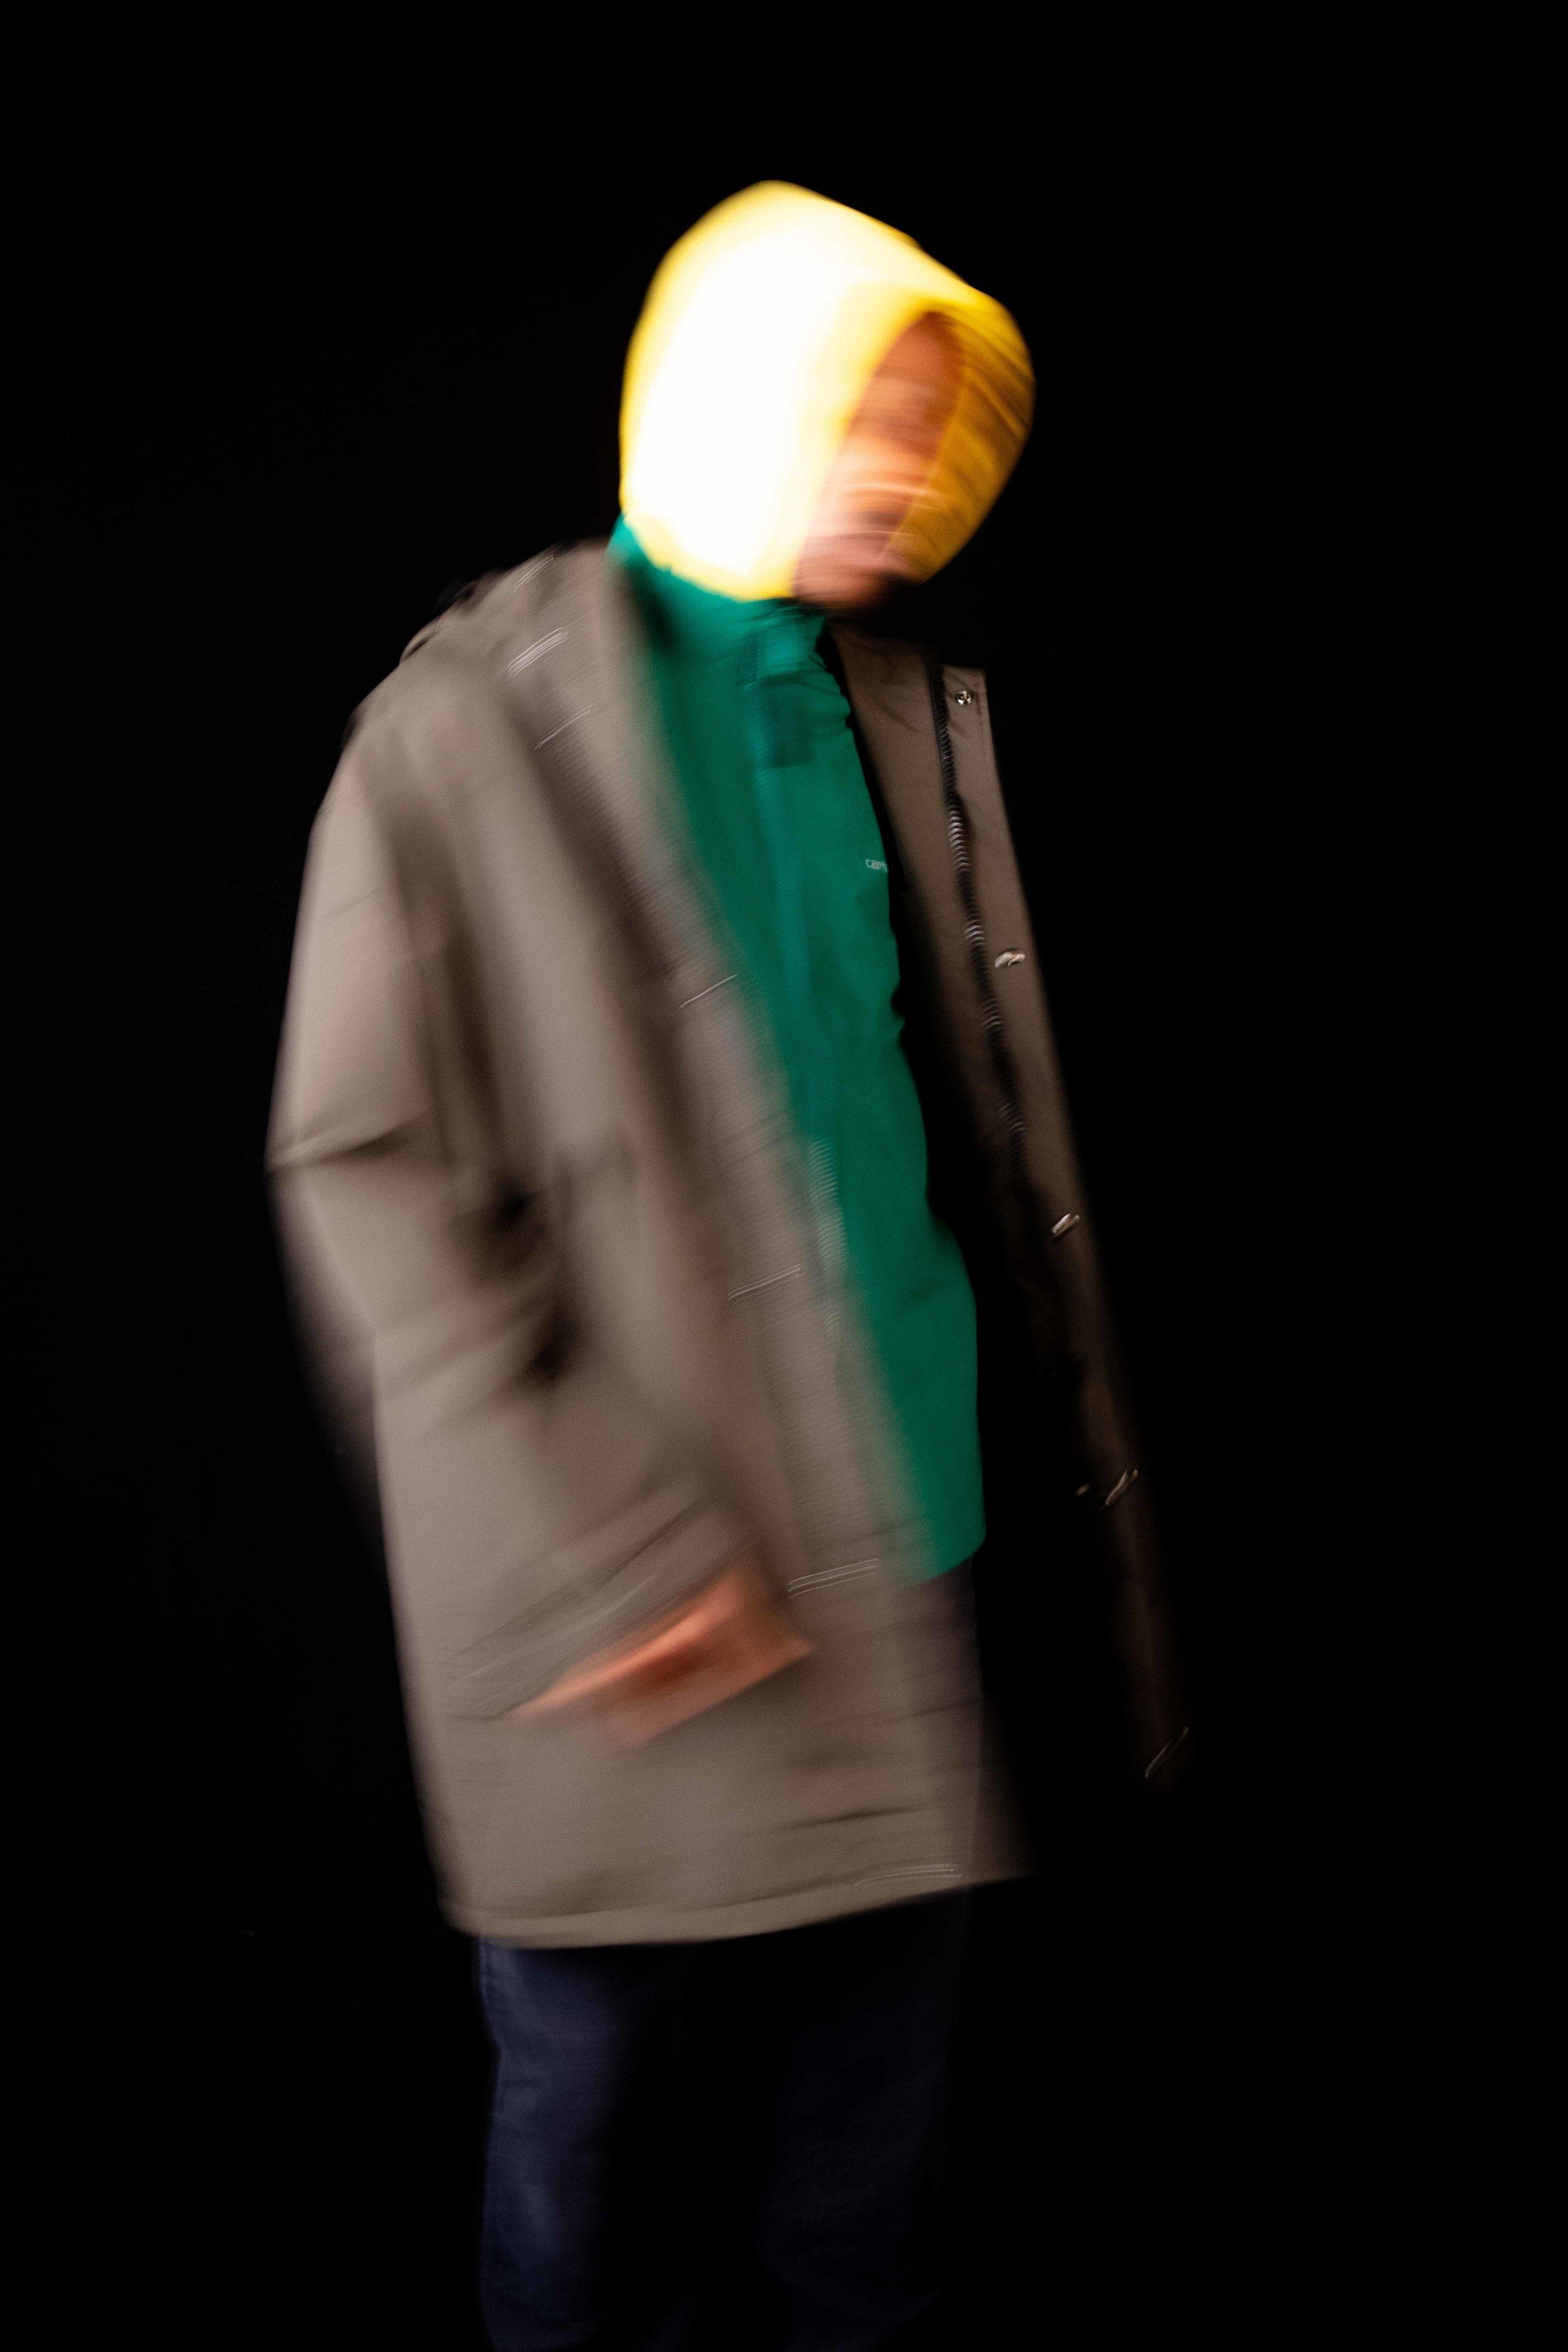 Ashby Parka, Casper Jacket, Hooded Carhartt Sweatshirt